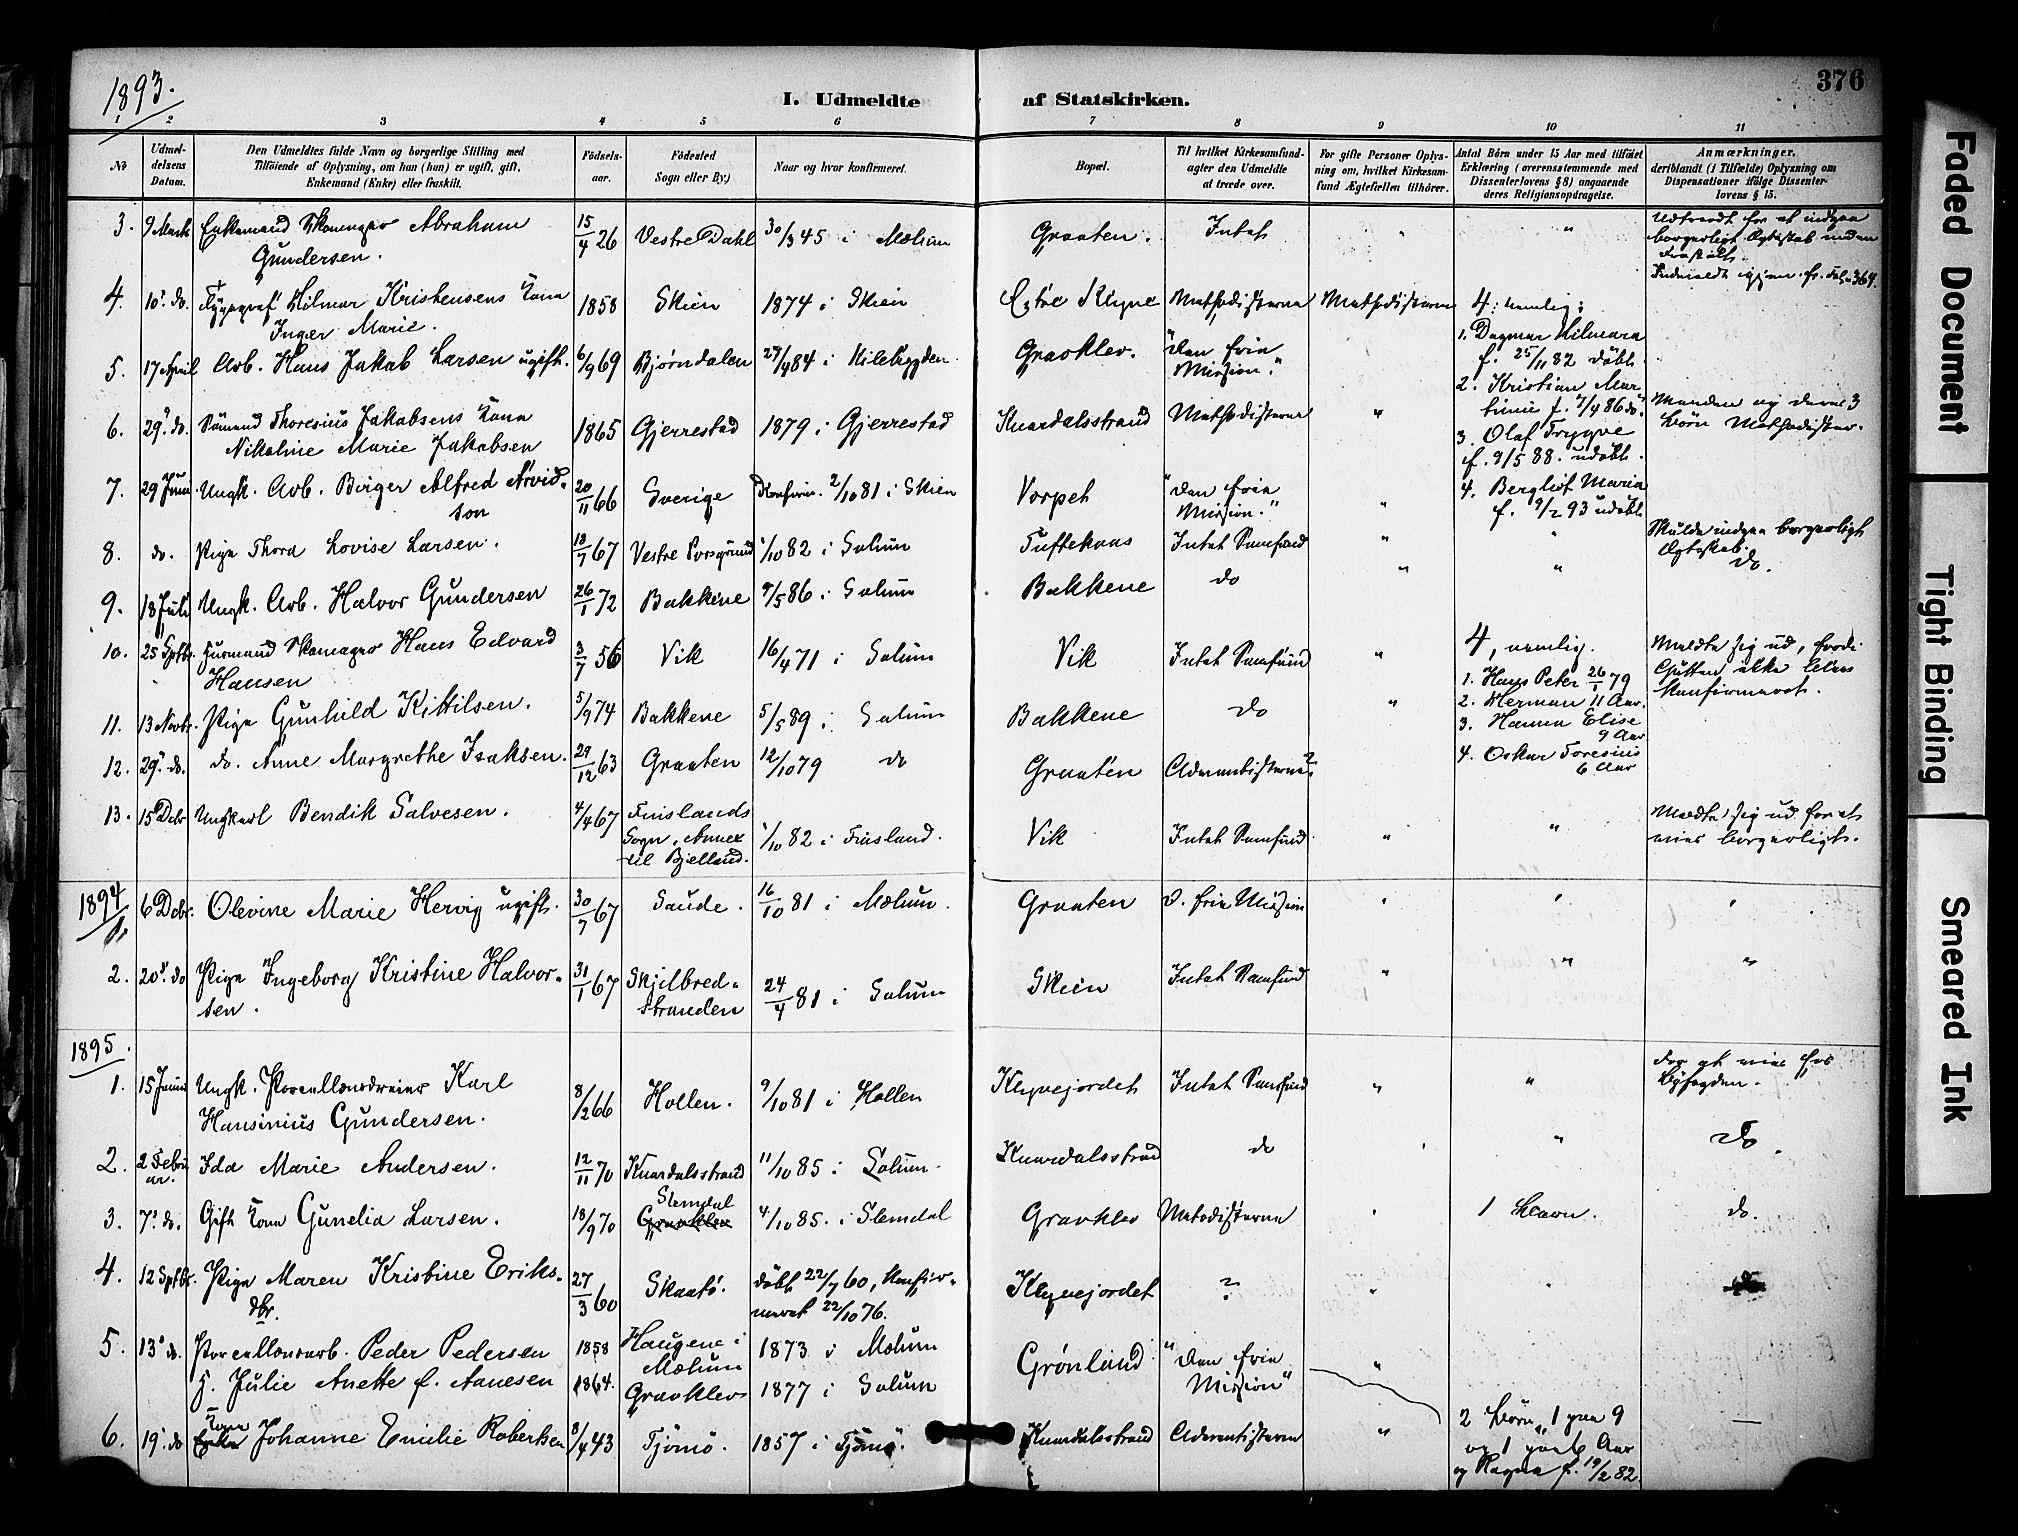 SAKO, Solum kirkebøker, F/Fa/L0010: Ministerialbok nr. I 10, 1888-1898, s. 376